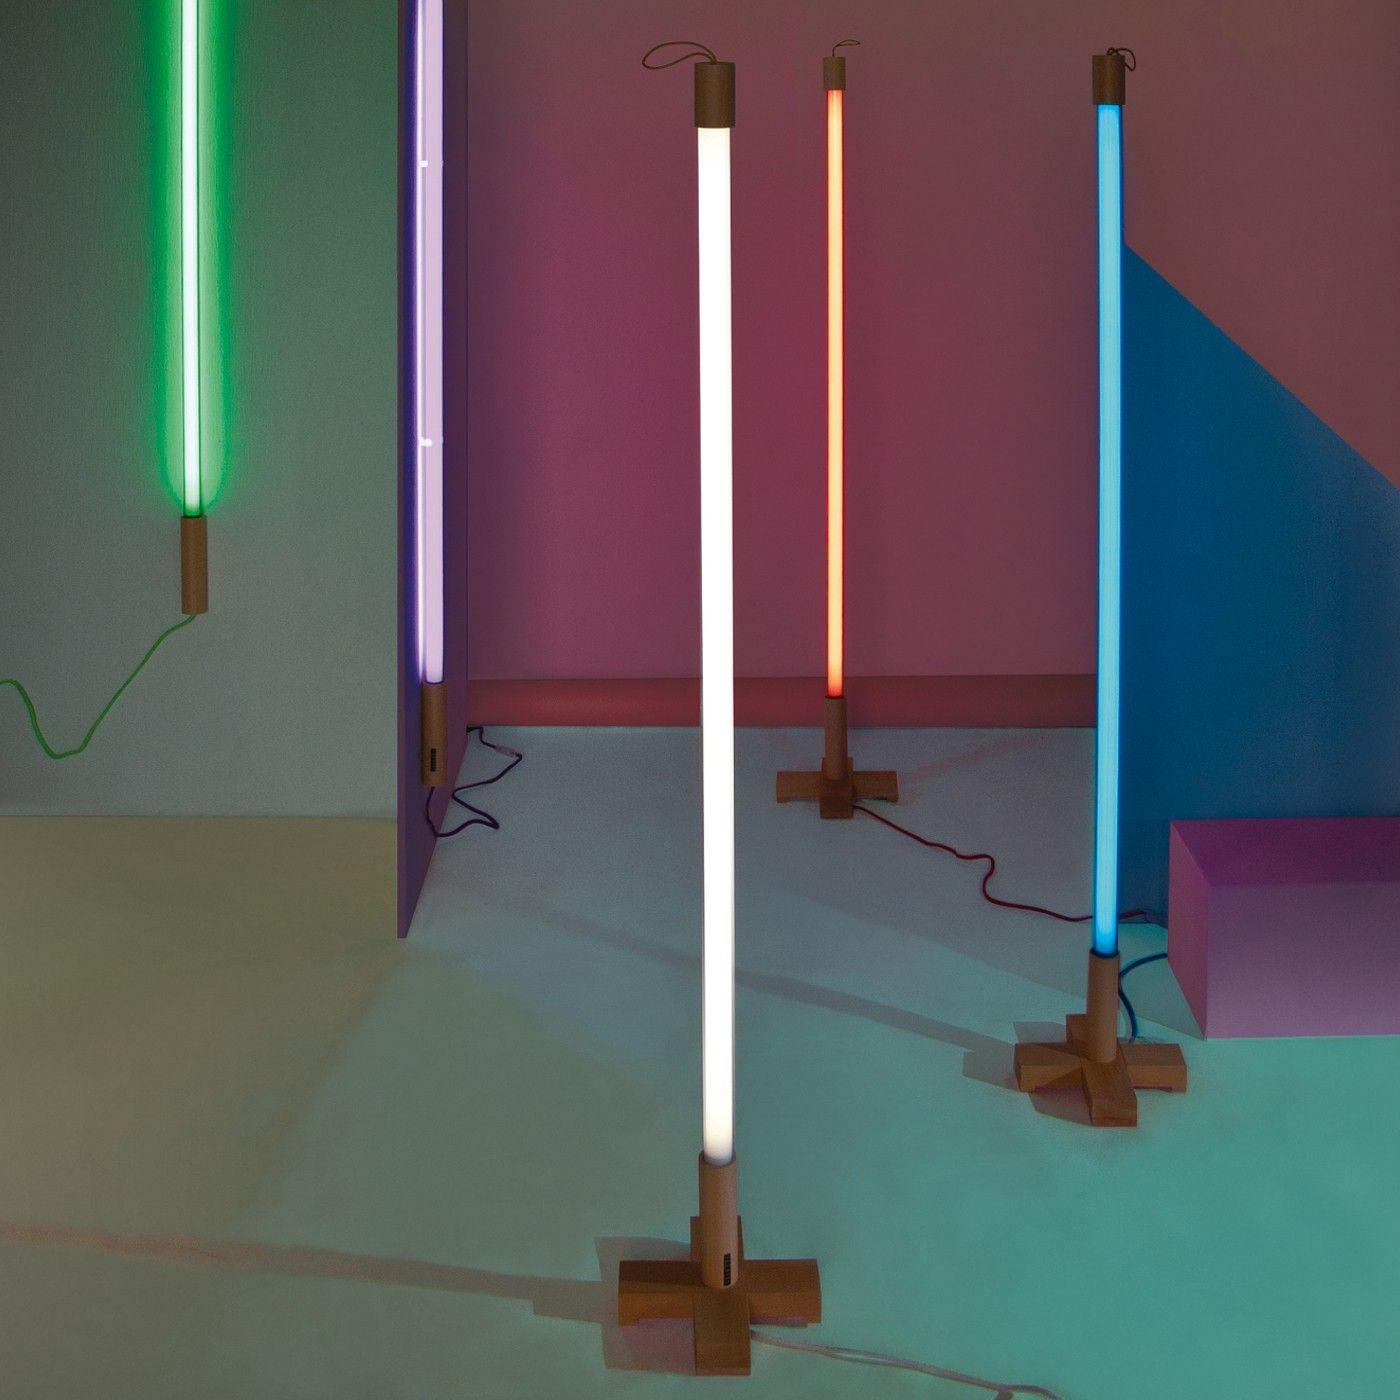 Sleek, sculptural, and stylish, the Seletti Light Tube lends